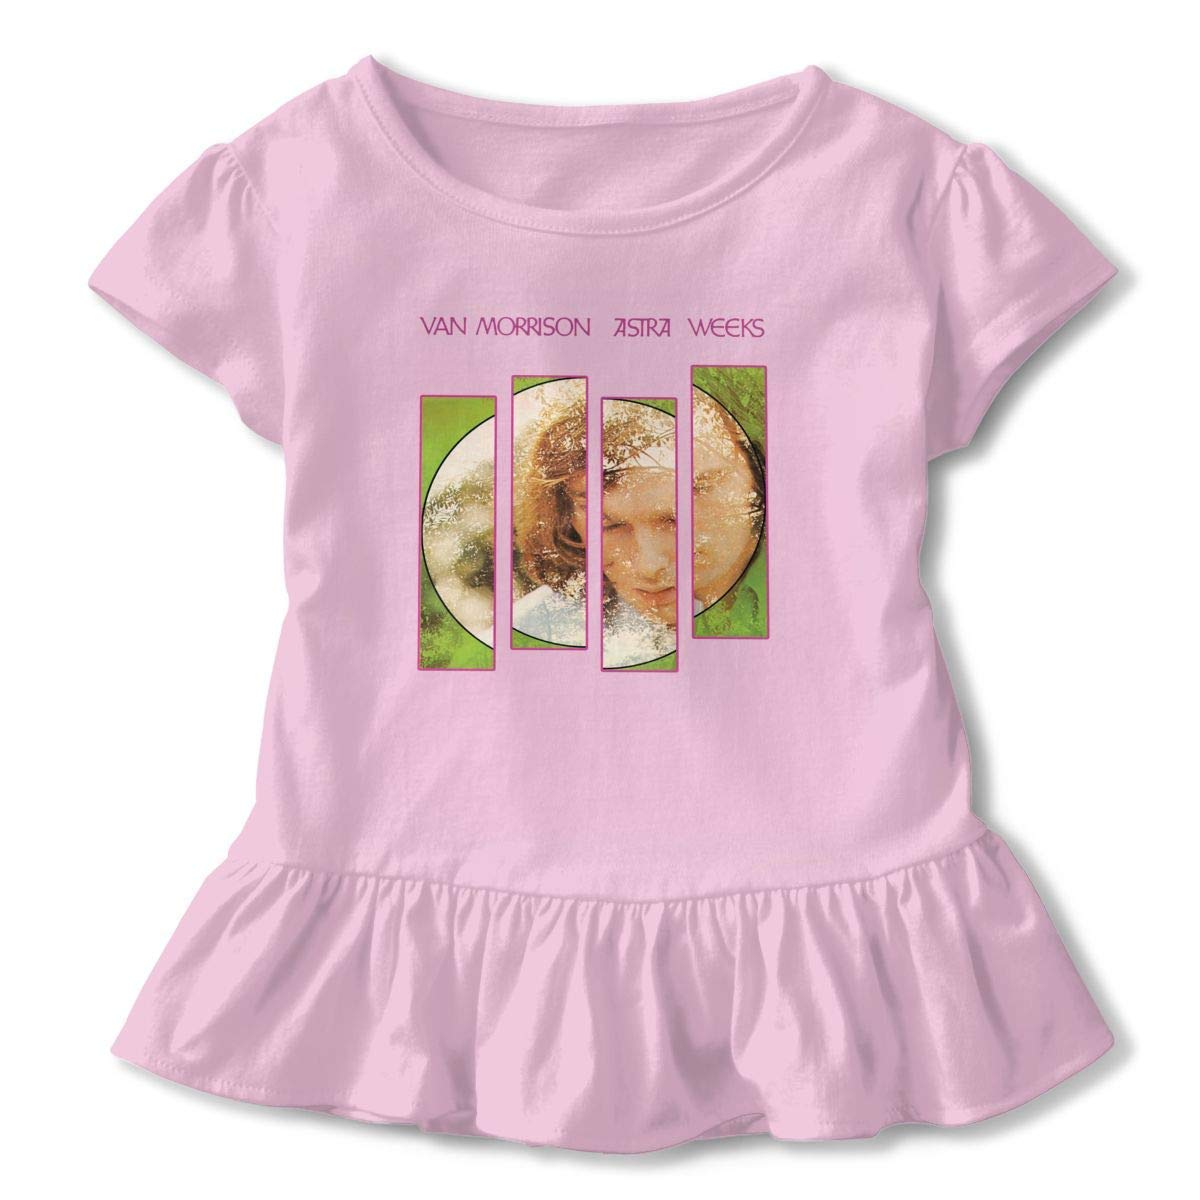 Kid T Shirt Van Morrison Astral Weeks Cotton Music Bands 3D Tee Baseball Ruffle Short Sleeve Cotton Shirts Top for Girls Kids